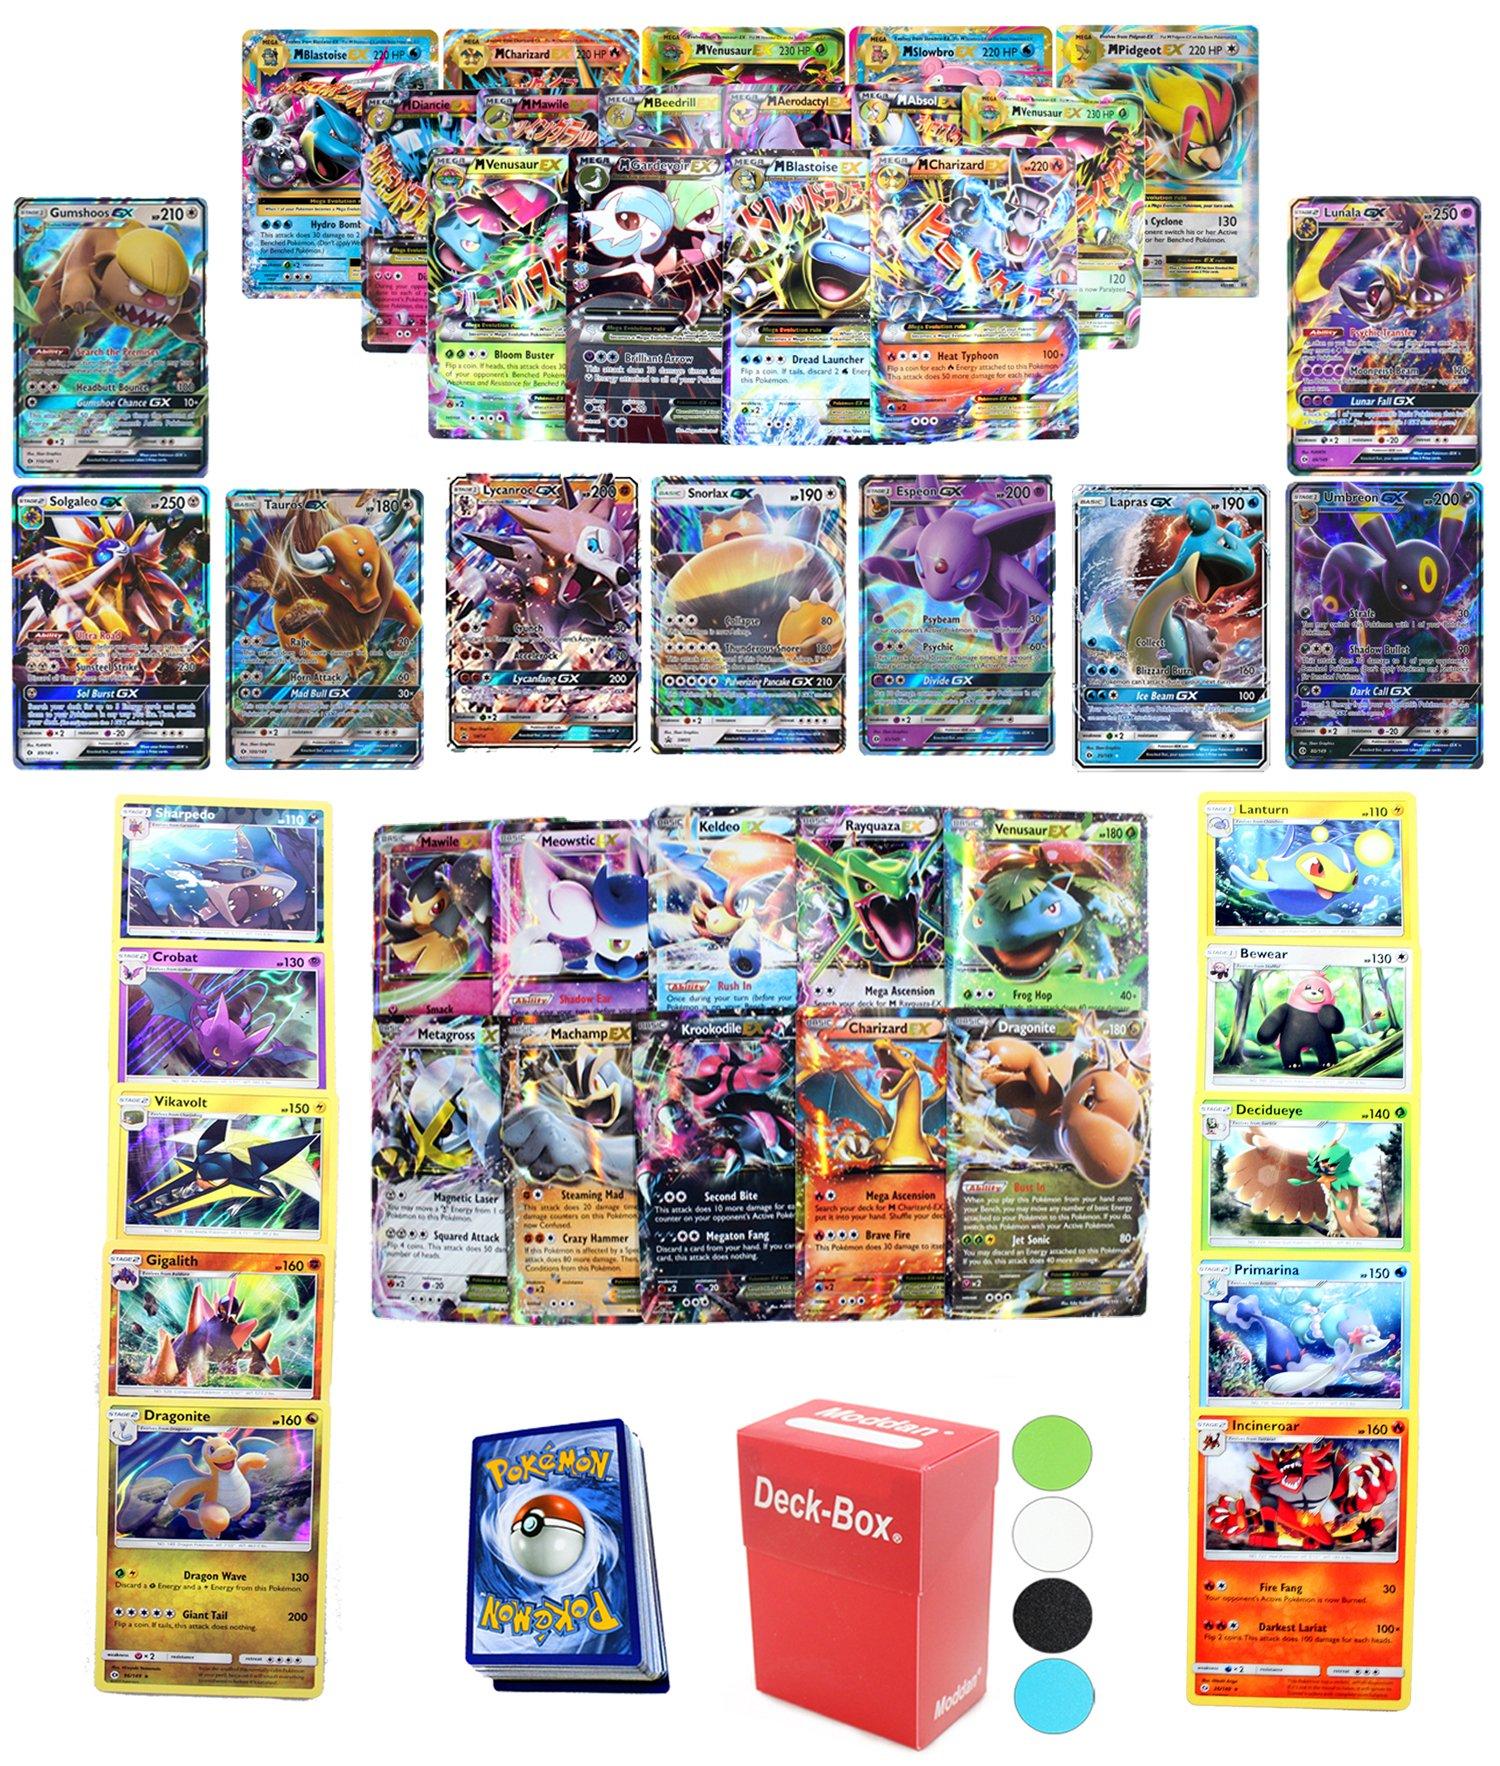 Amazon.com: 5 Total GX Pokemon Cards, Ex, Mega Ex, Or